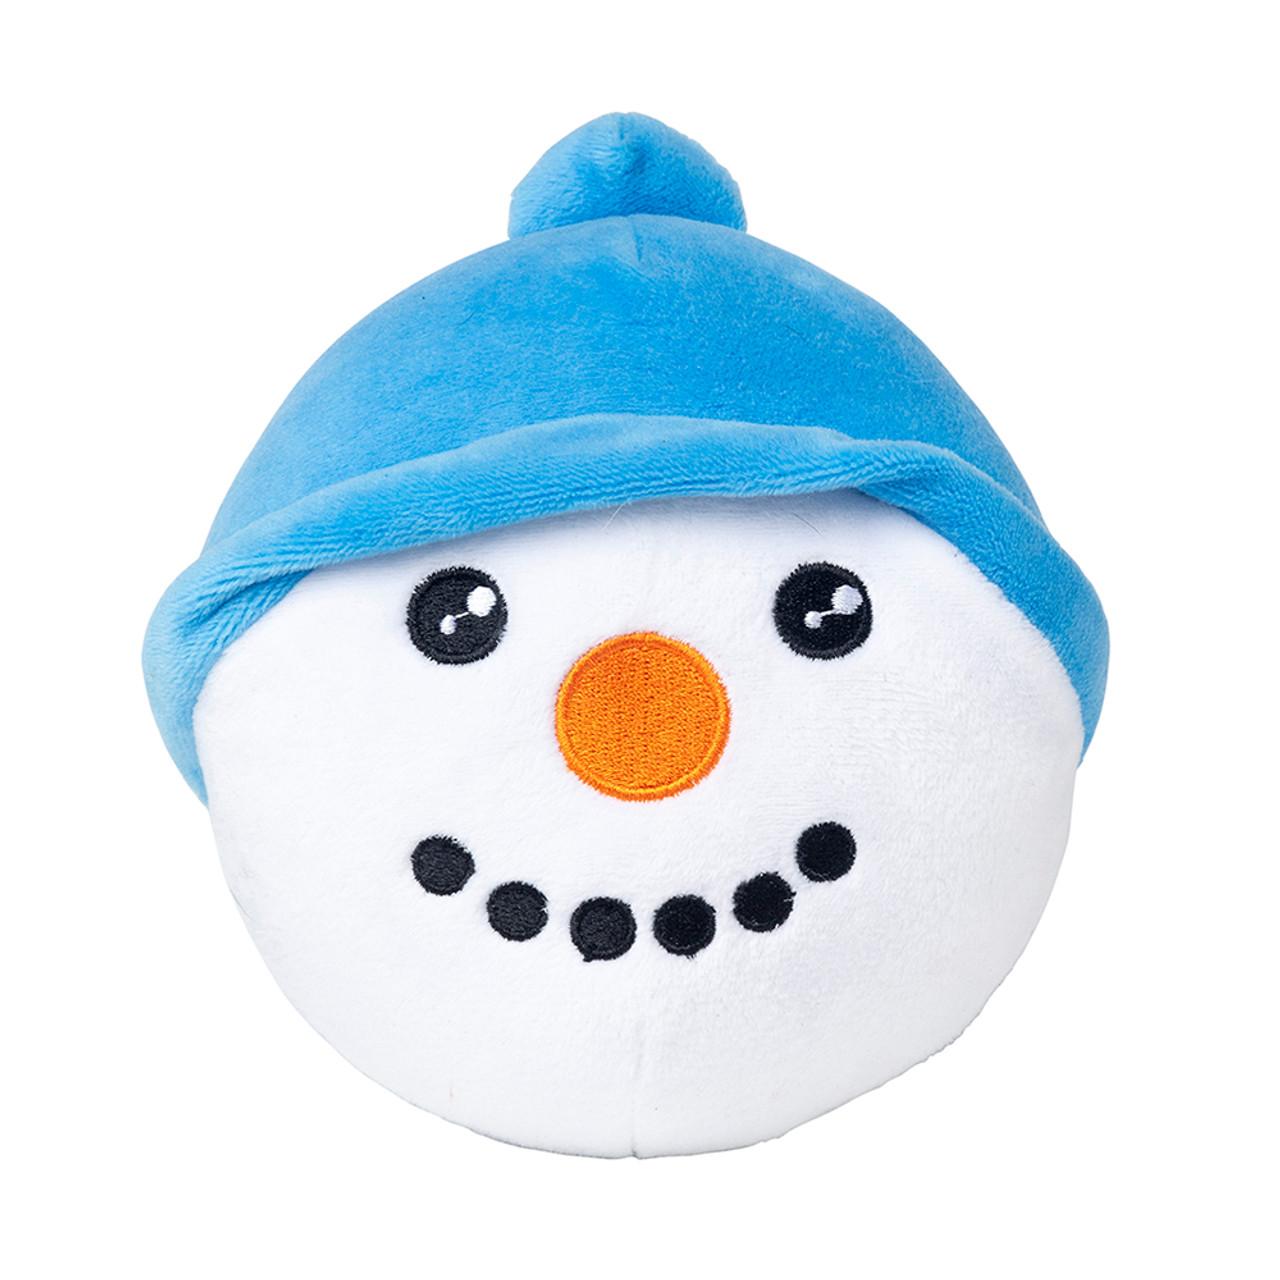 FuzzYard Holiday Snowman Ball Plush Dog Toy